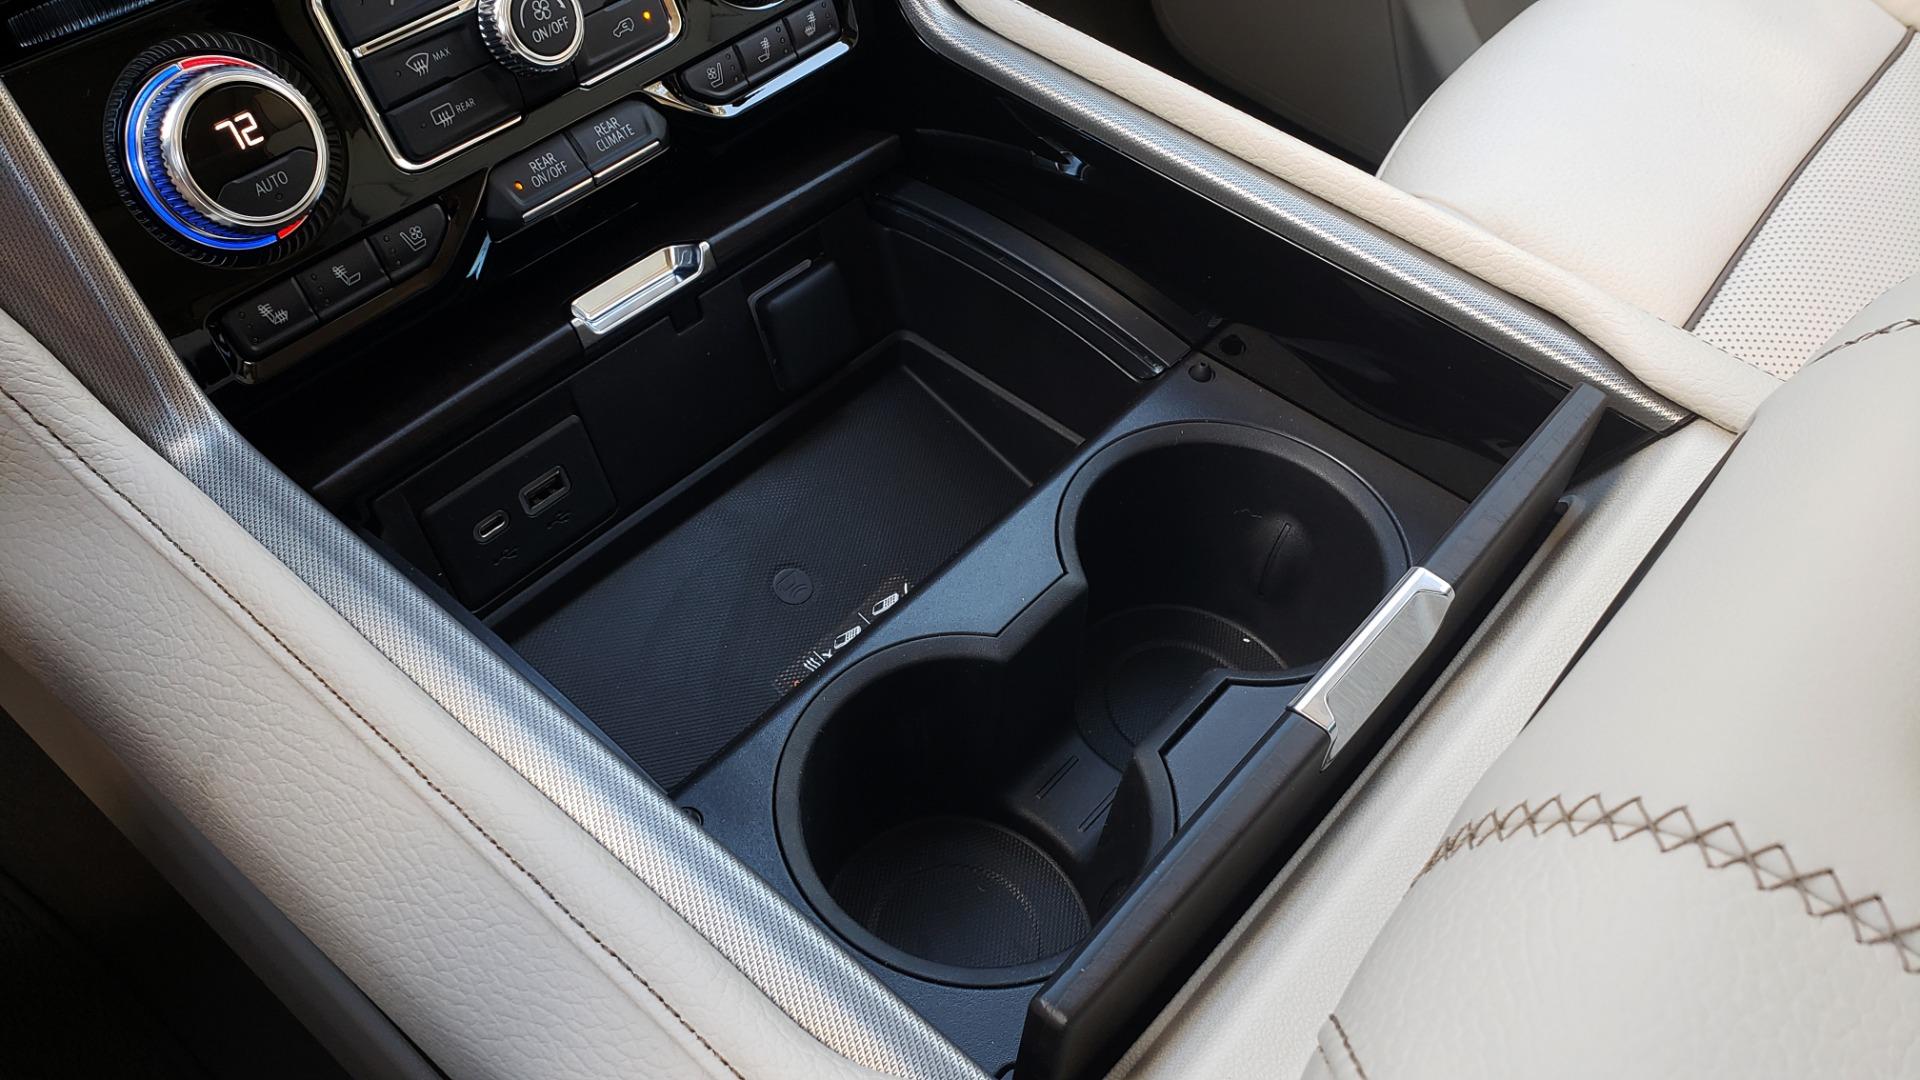 Used 2021 GMC YUKON DENALI PREMIUM 4WD / NAV / ADVANCED TECH / ENTERTAINMENT for sale Sold at Formula Imports in Charlotte NC 28227 55